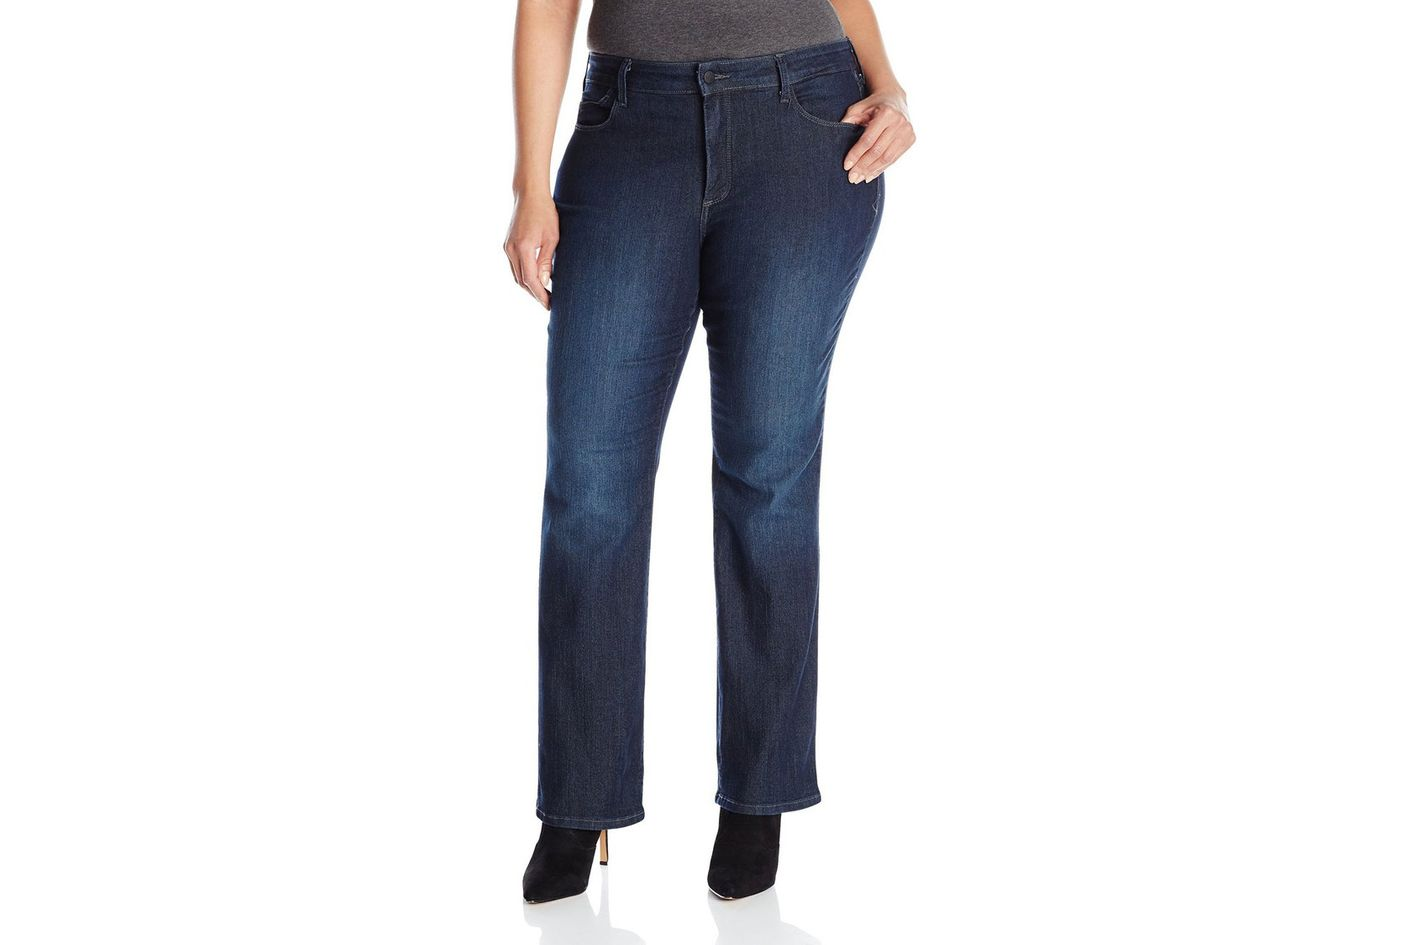 NYDJ Bootcut Jeans